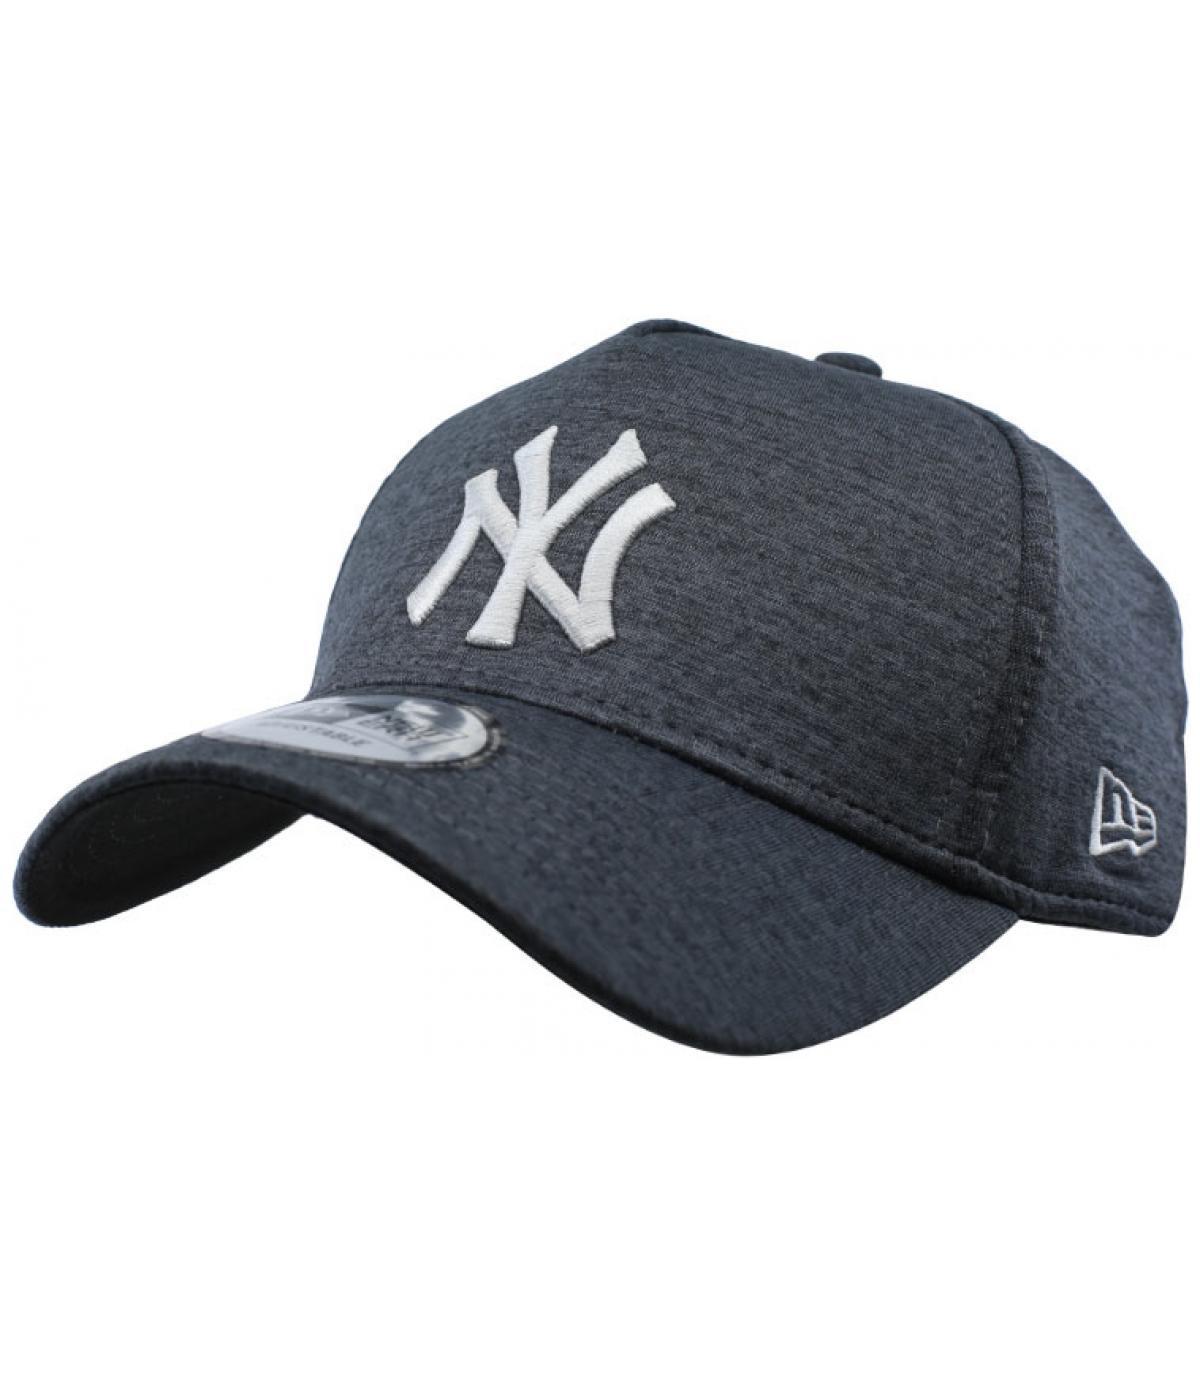 Cap NY schwarz grau Aframe